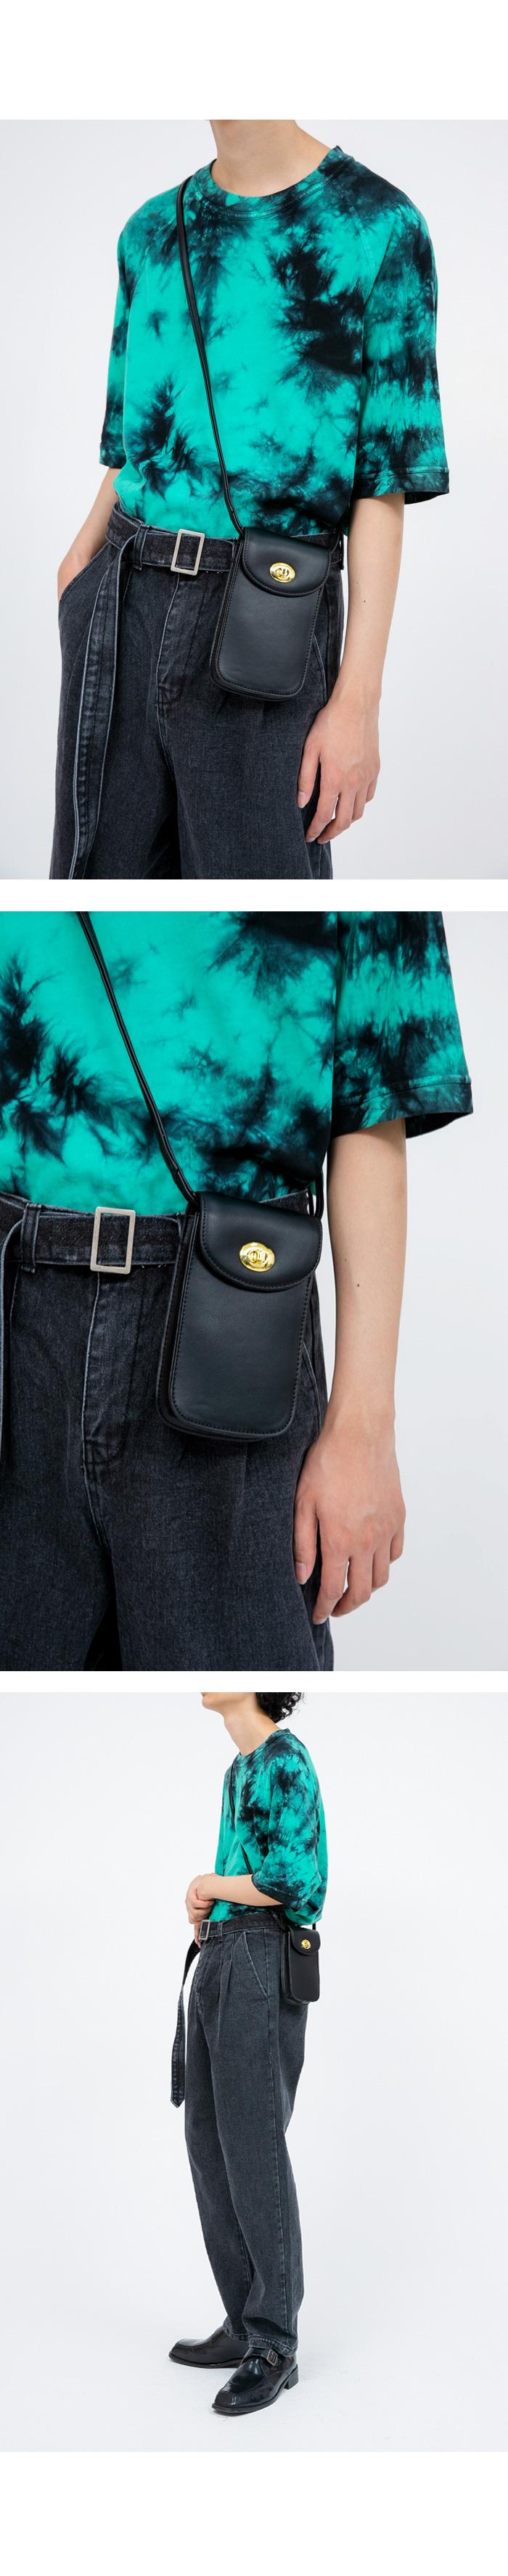 gold buckle mini leather cross bag